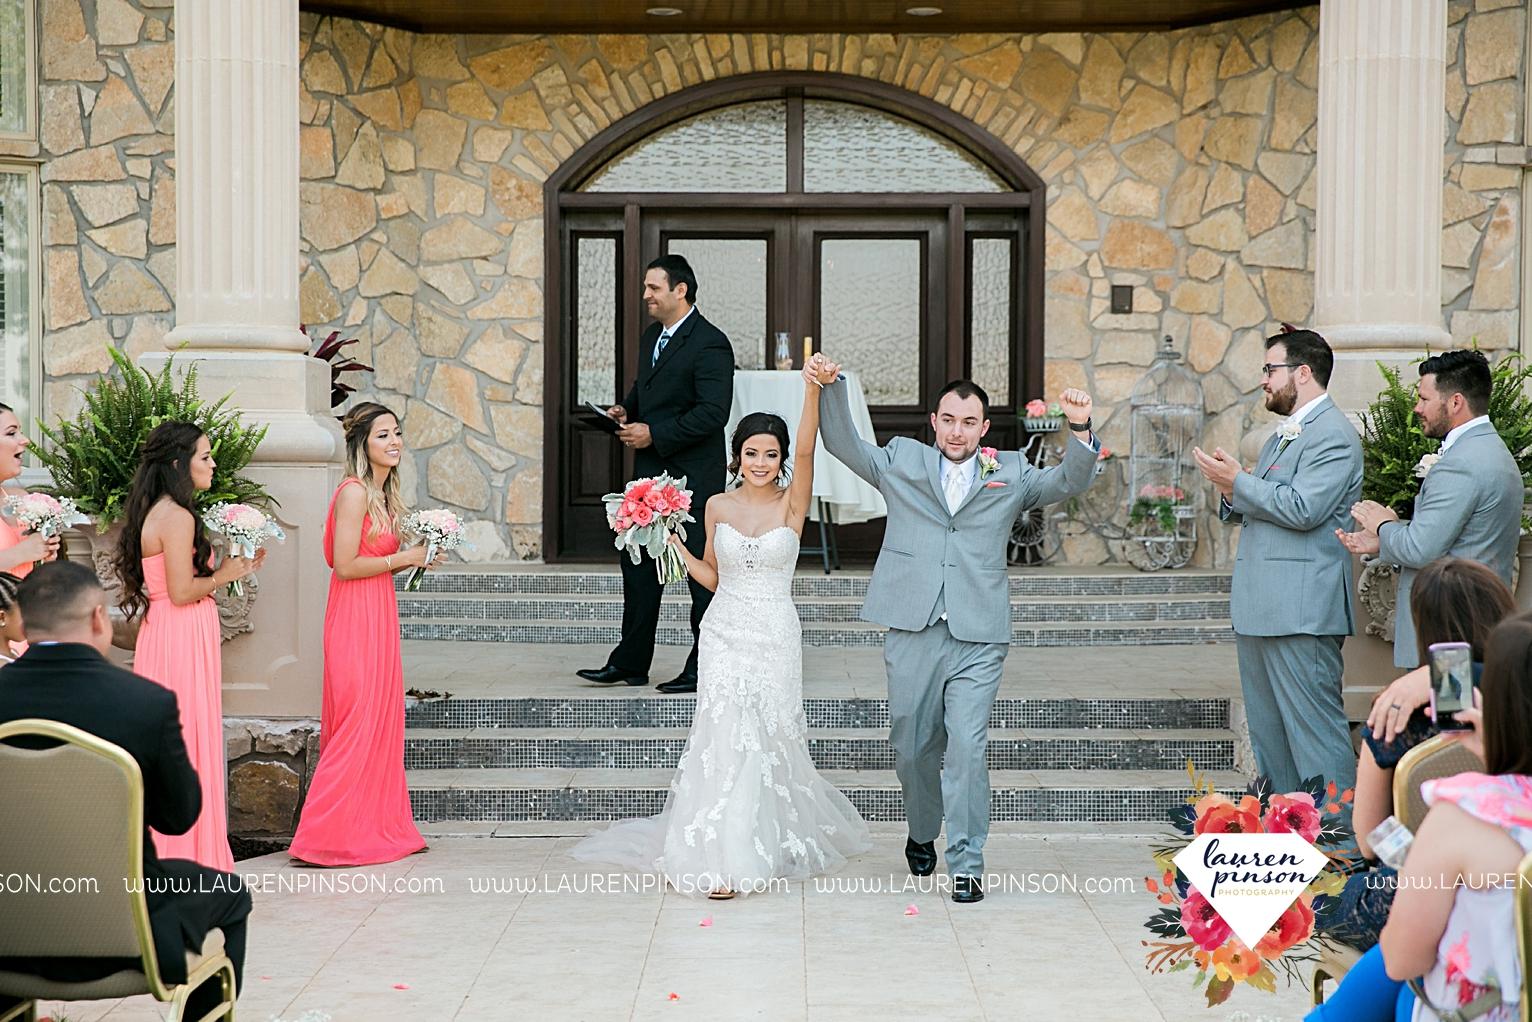 wichita-falls-wedding-nocona-comanche-rose-ranch-rustic-pink-gray-photography-00141.jpg